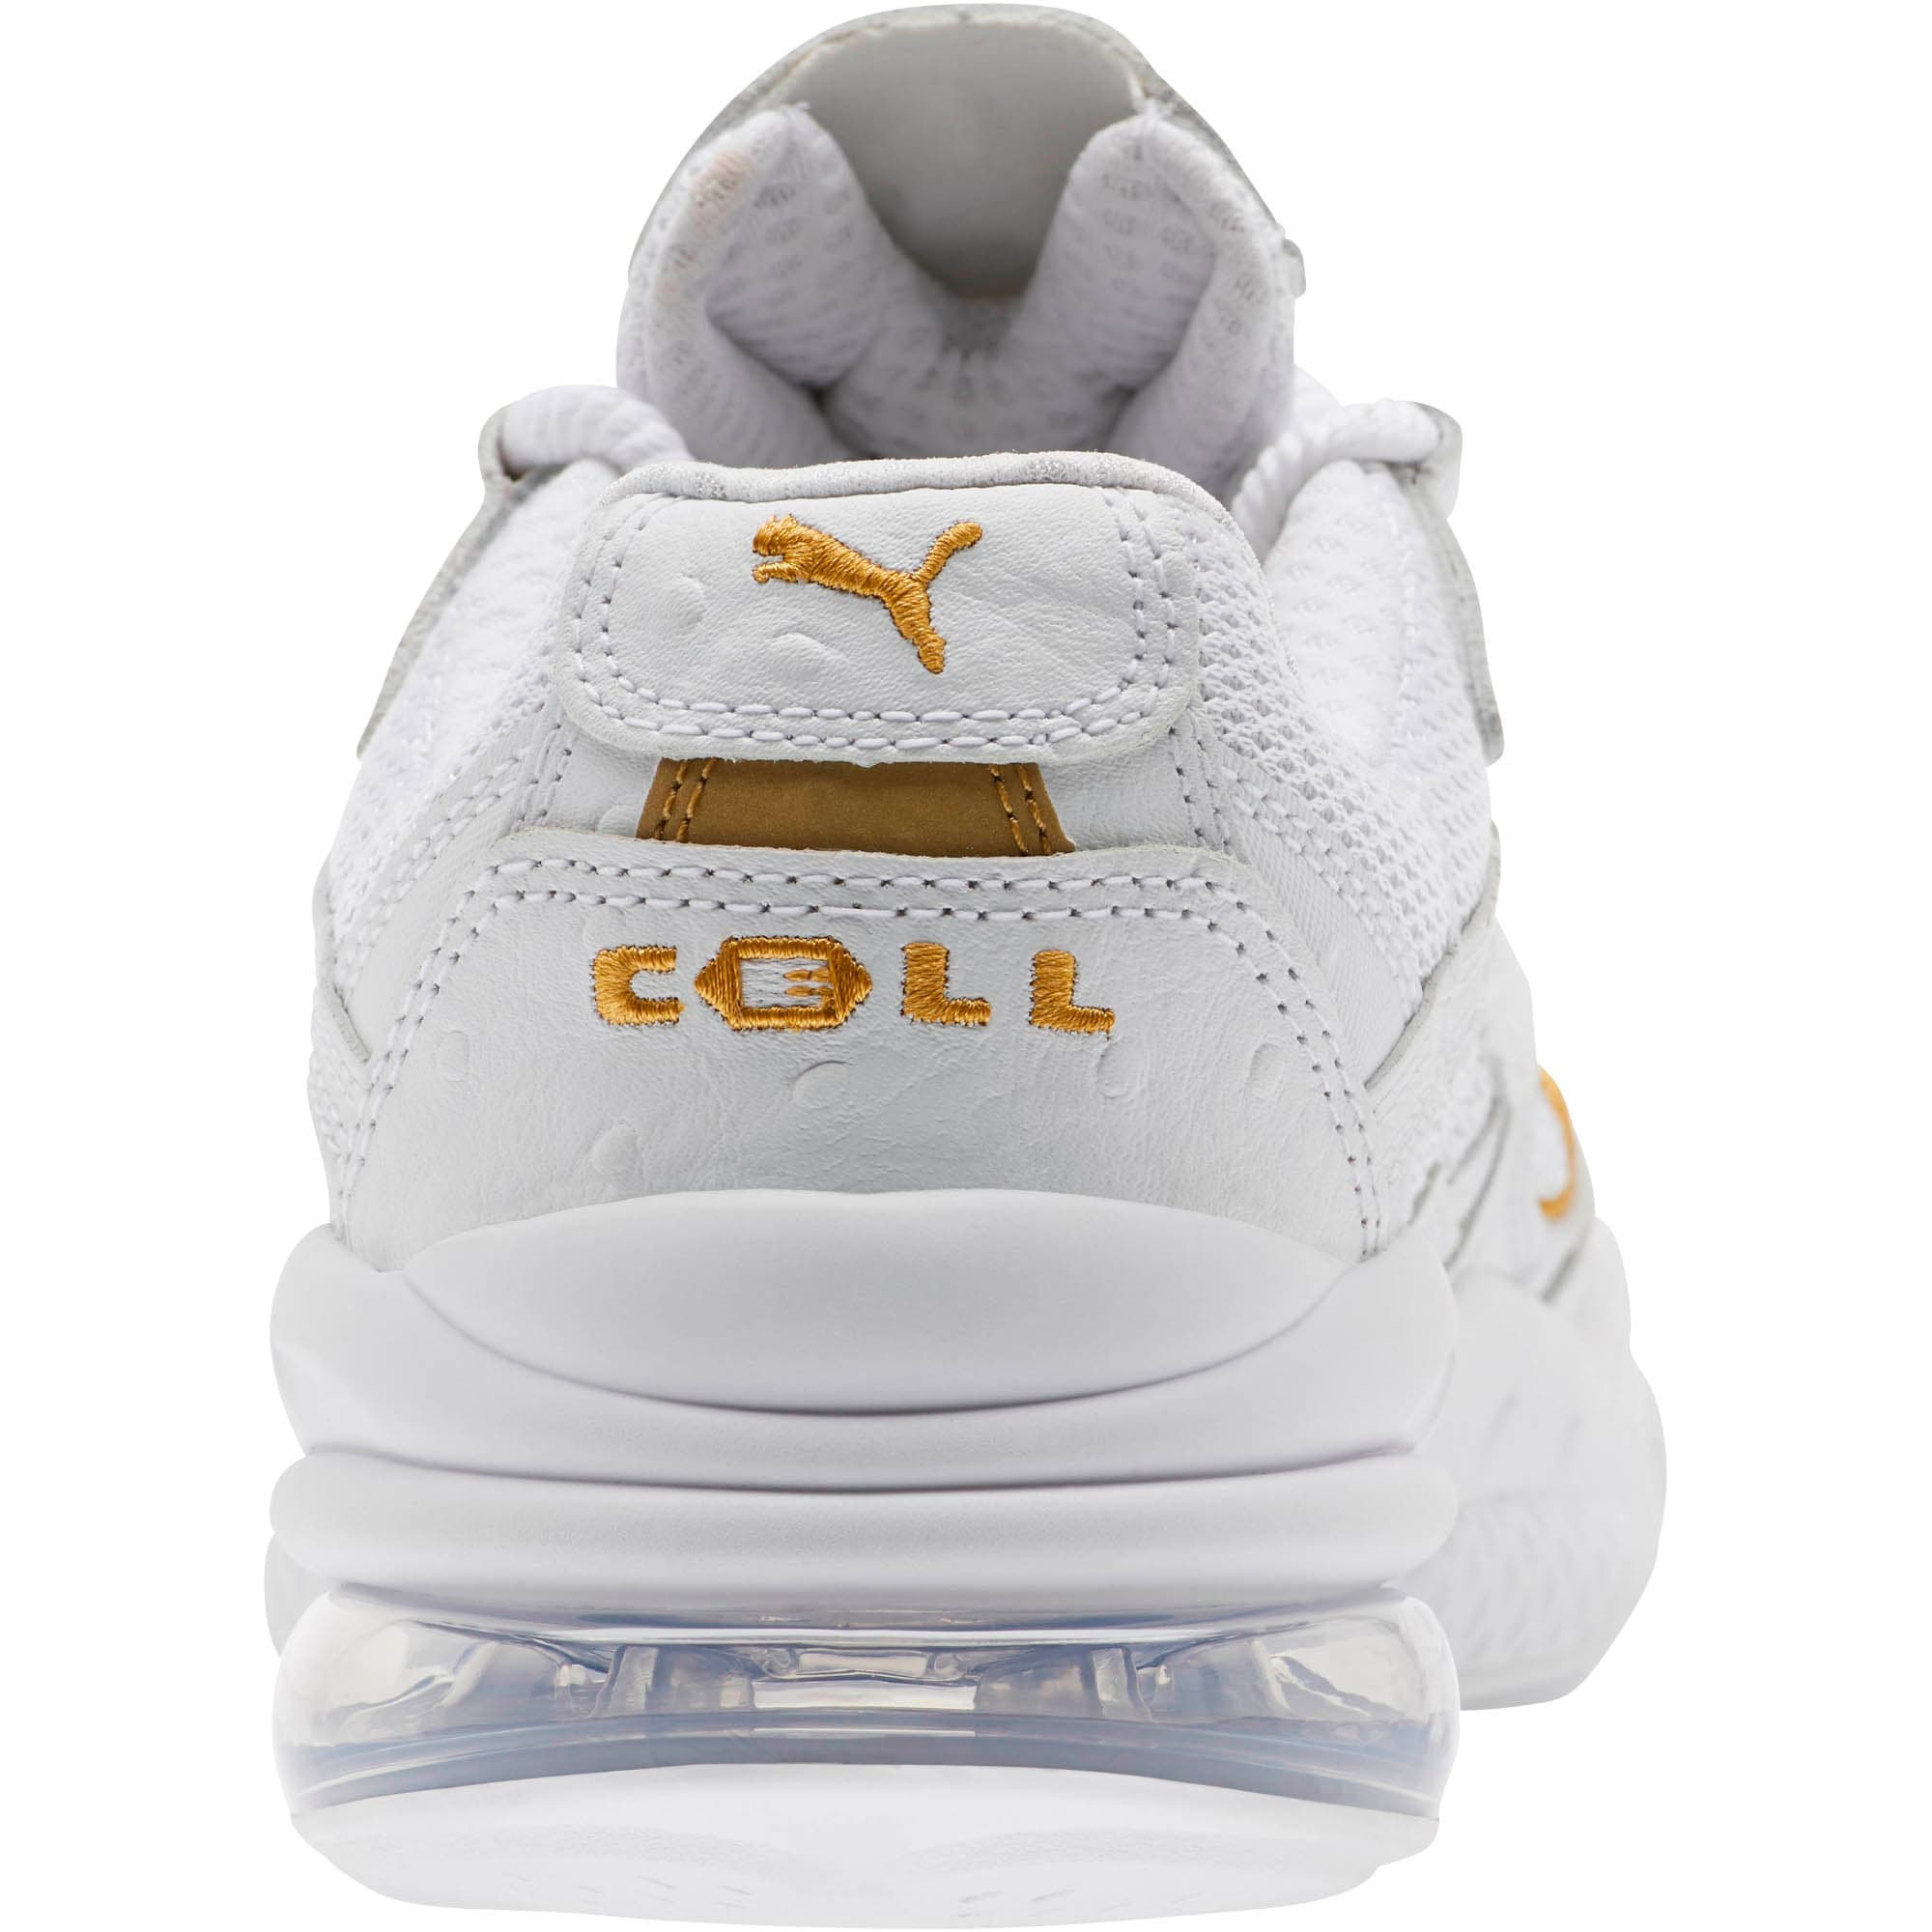 Thumbnail 3 of CELL Venom WO Women's Sneakers, Puma White-Puma Team Gold, medium